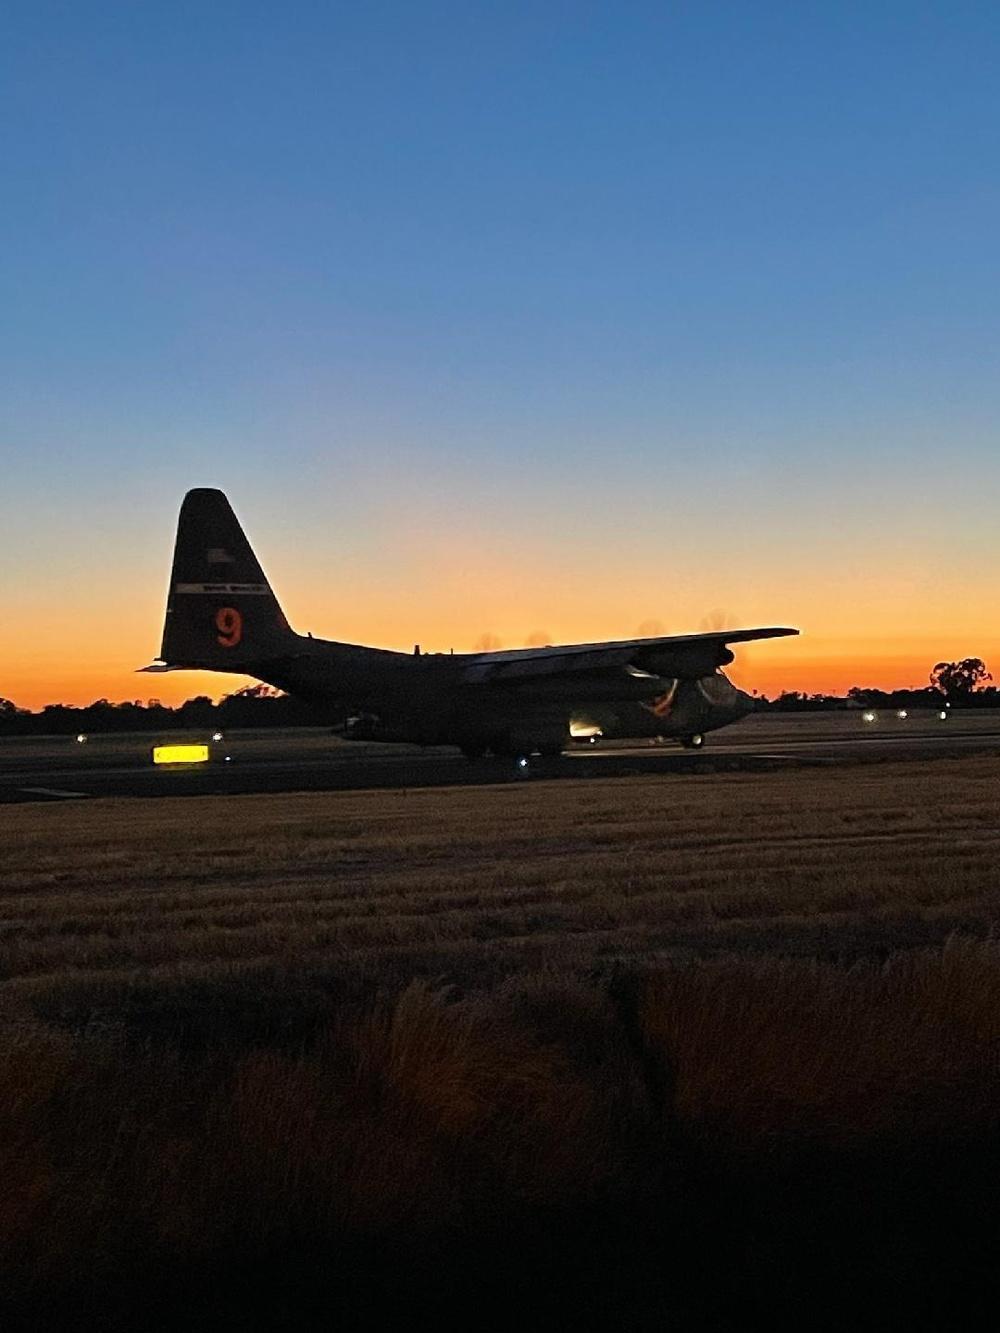 MAFFS 9 lands at McClellan Air Tanker Reload Base in Sacramento, California